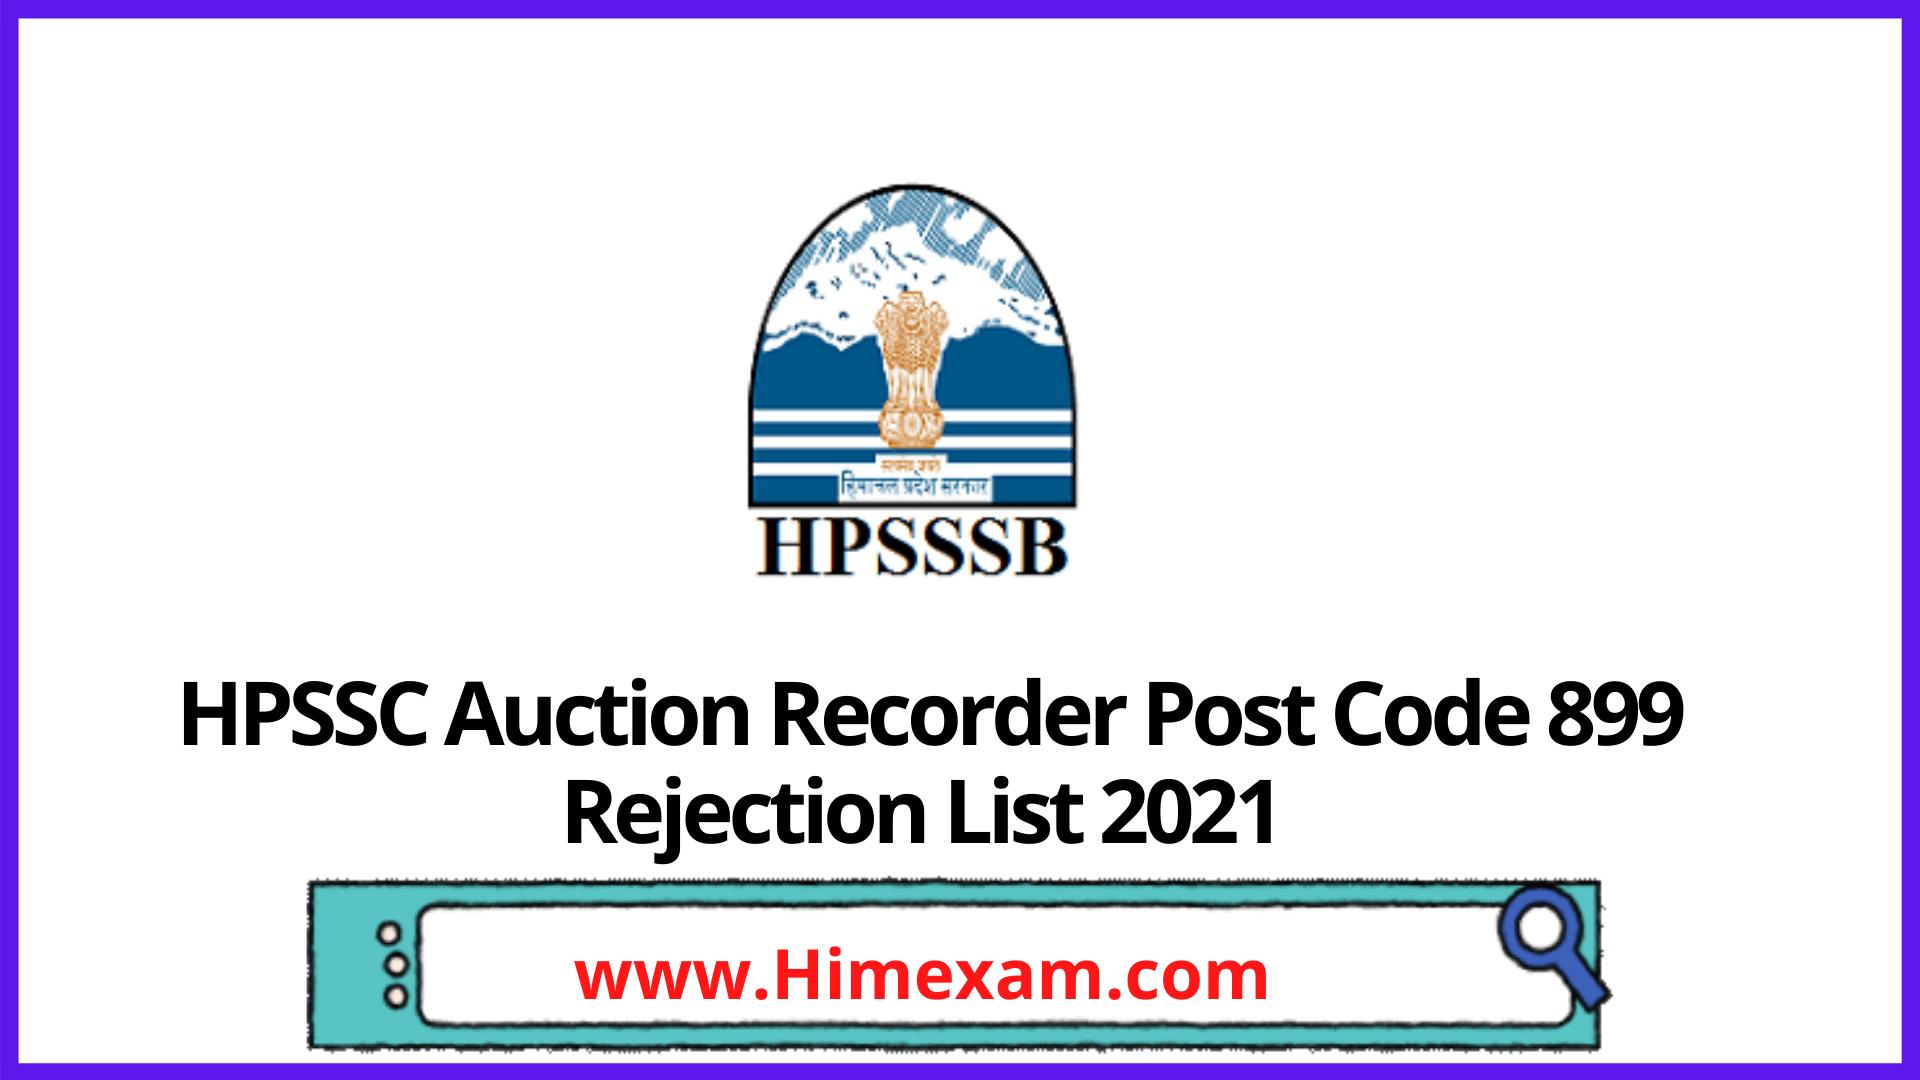 HPSSC Auction Recorder Post Code 899 Rejection List 2021